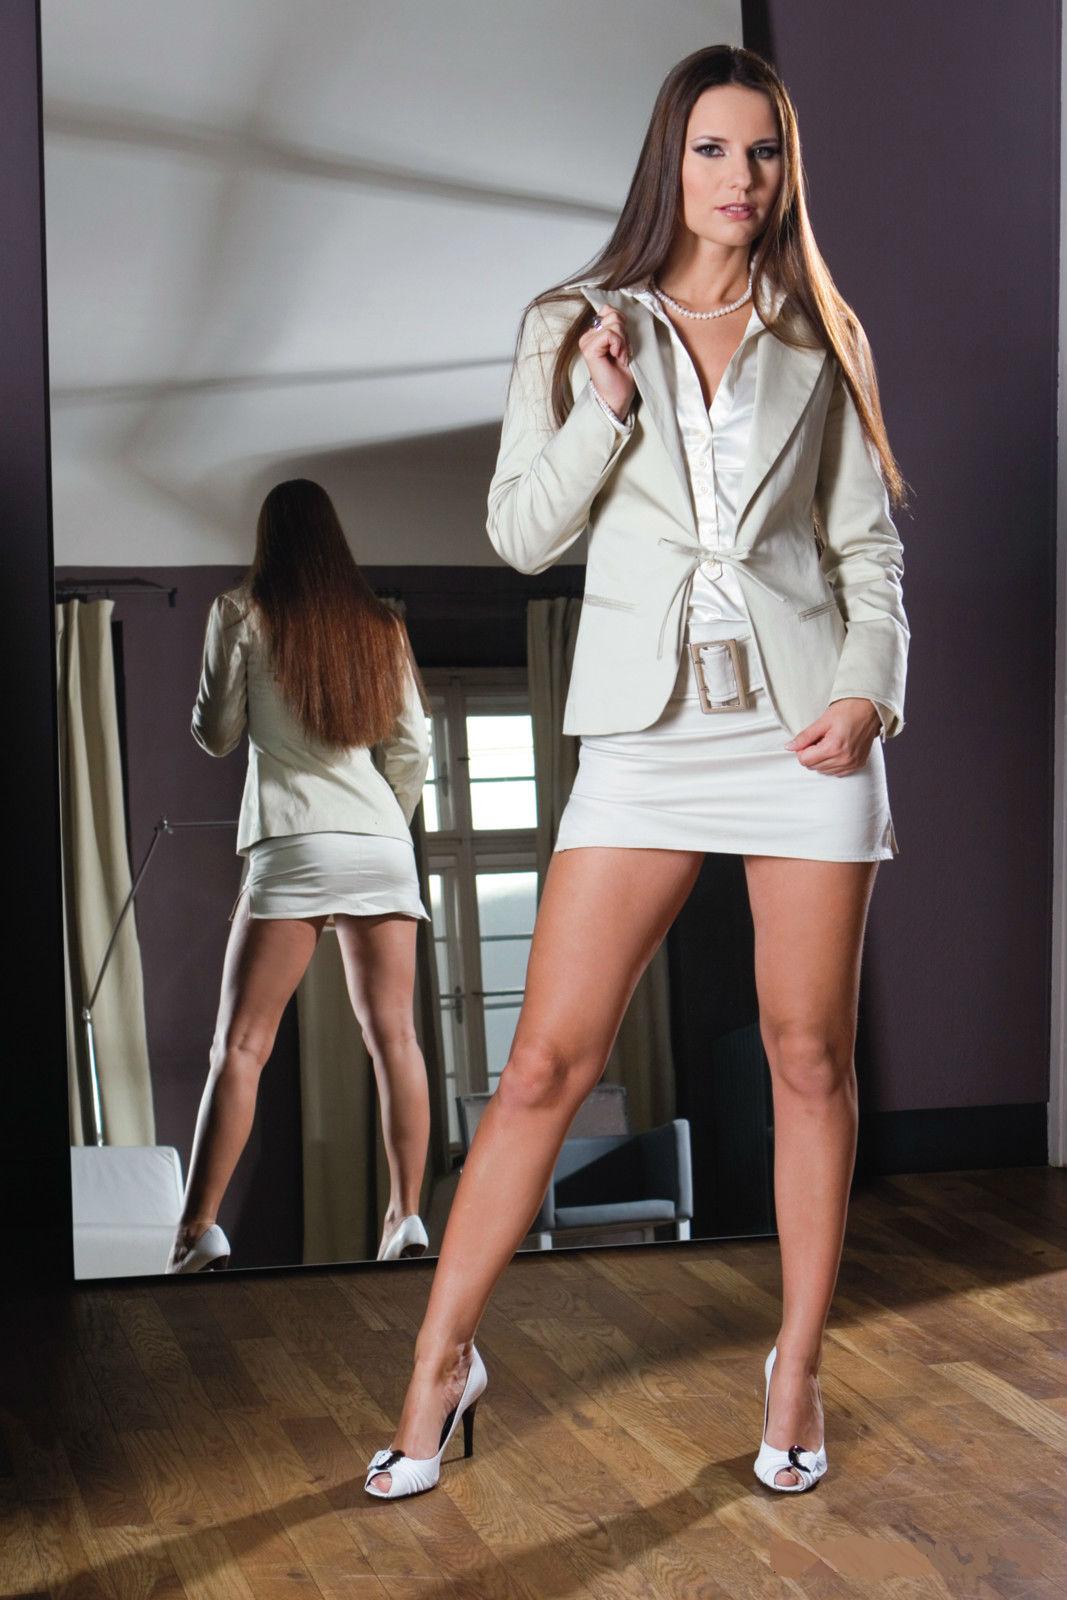 pornstar kay parker sexy legs mini skirt and sexy boobs 2